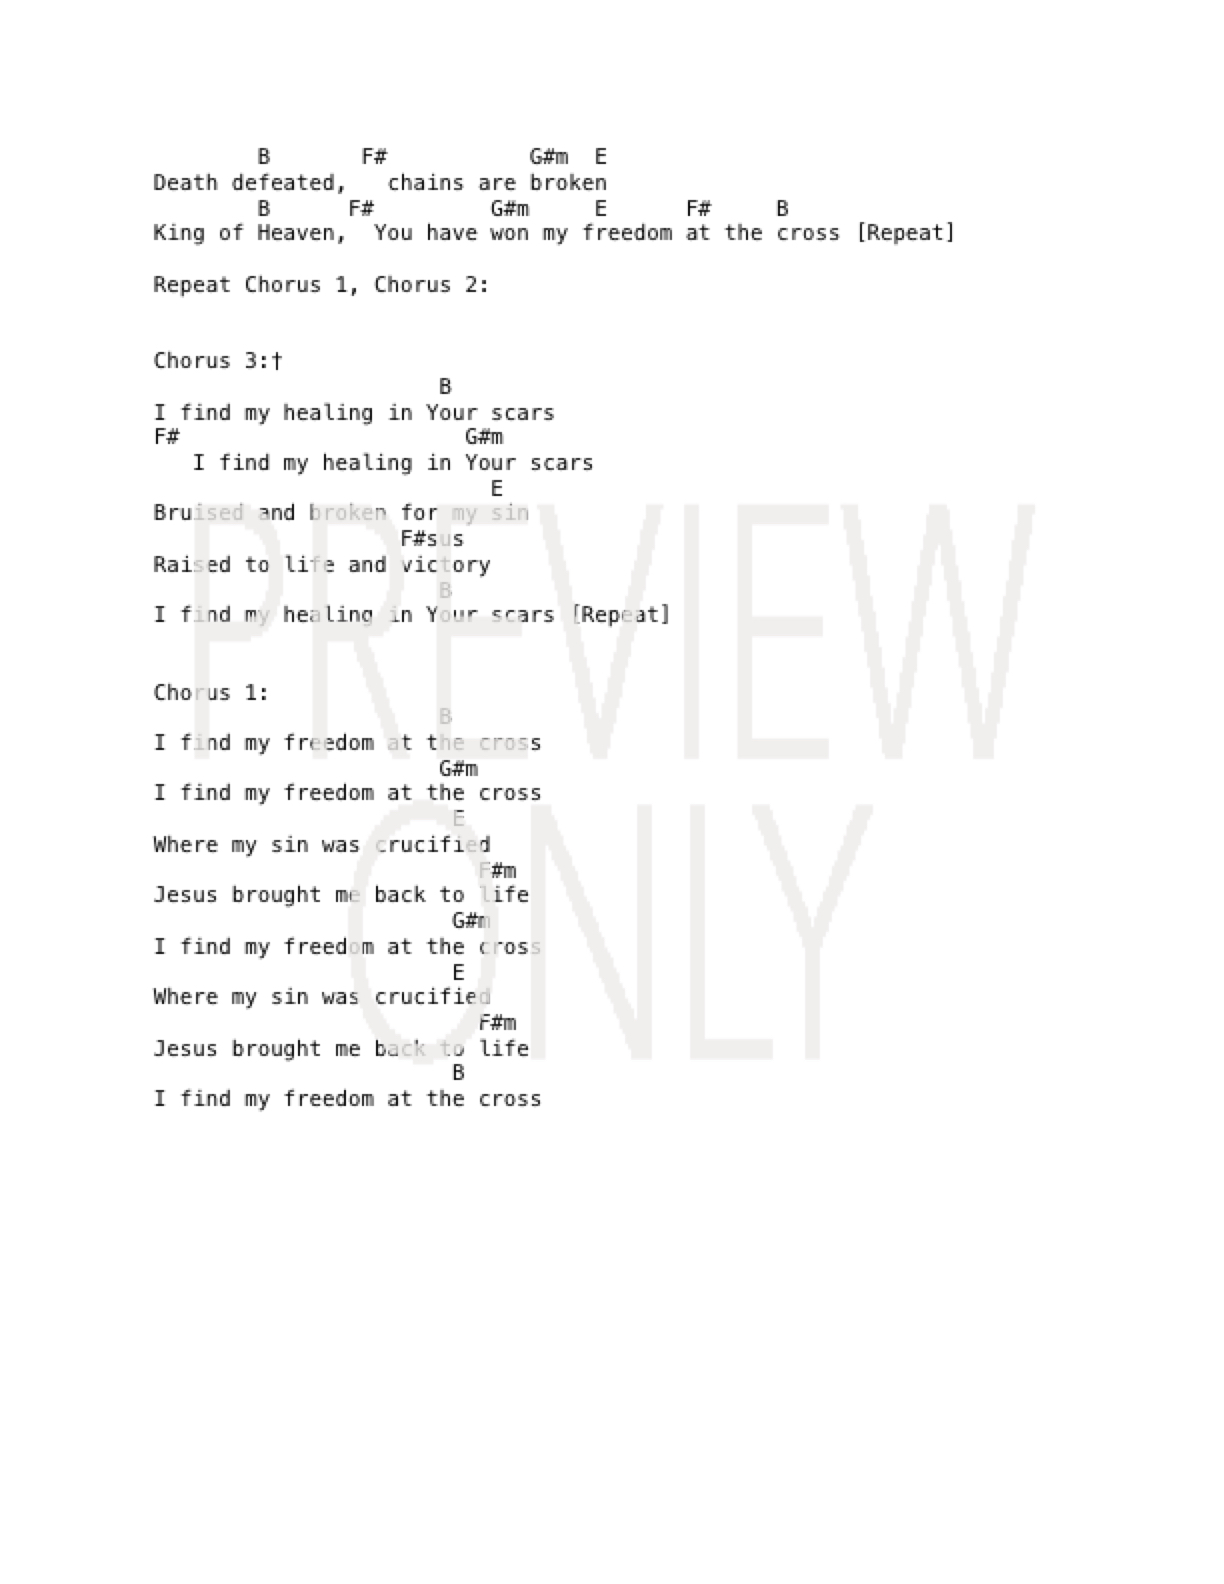 Freedom At The Cross Lead Sheet, Lyrics, & Chords | Life